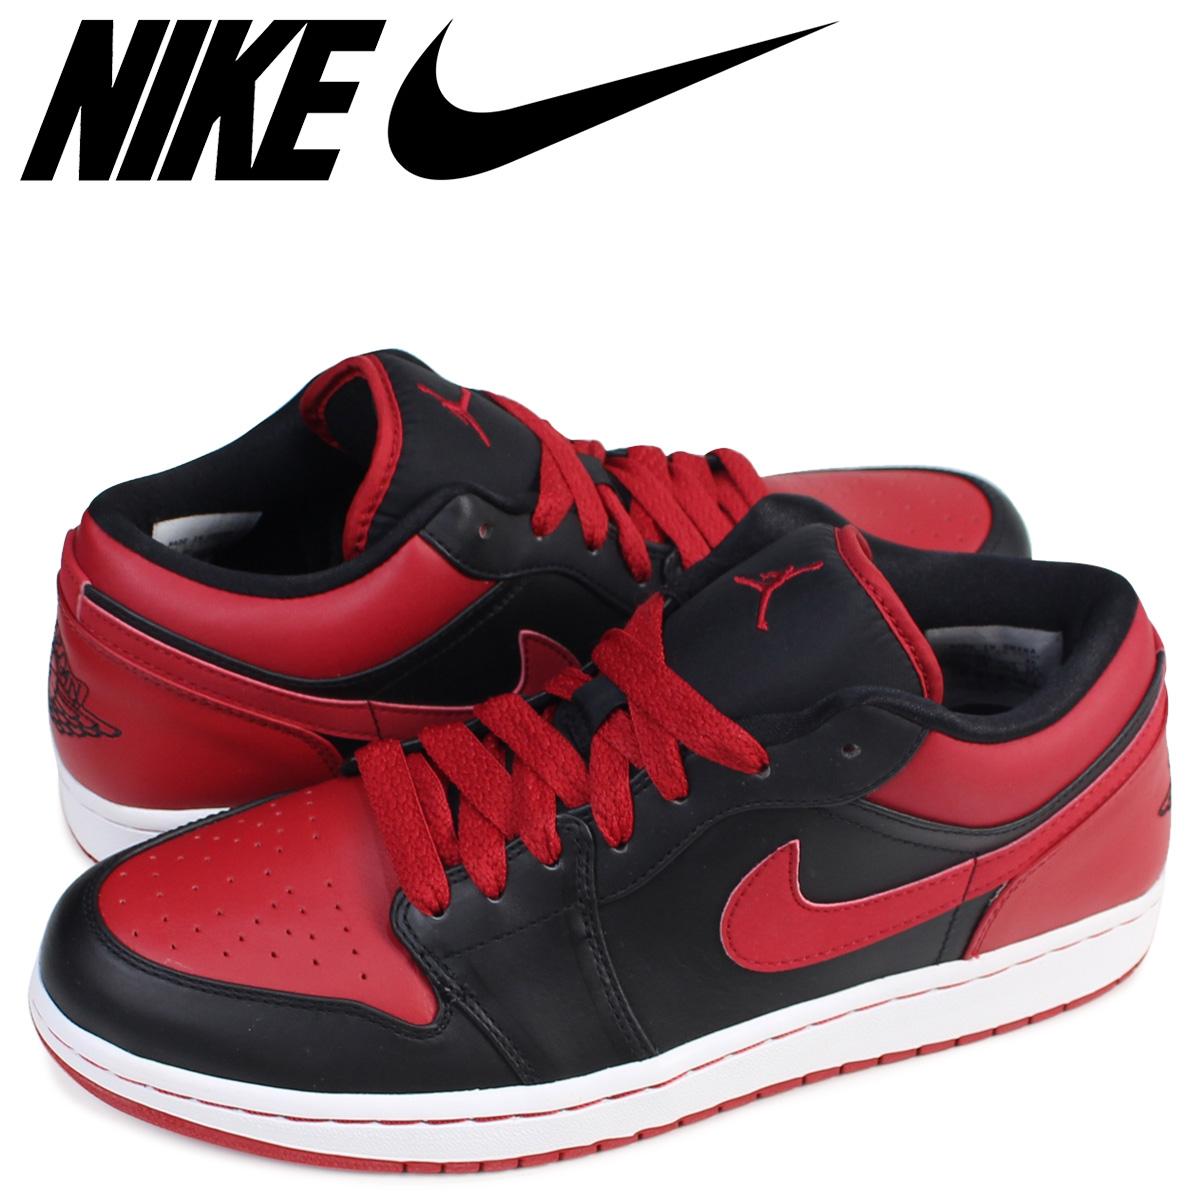 sports shoes e27b5 f55a5 ... hot nike nike air jordan 1 sneakers air jordan 1 phat low 338145 061  mens shoes